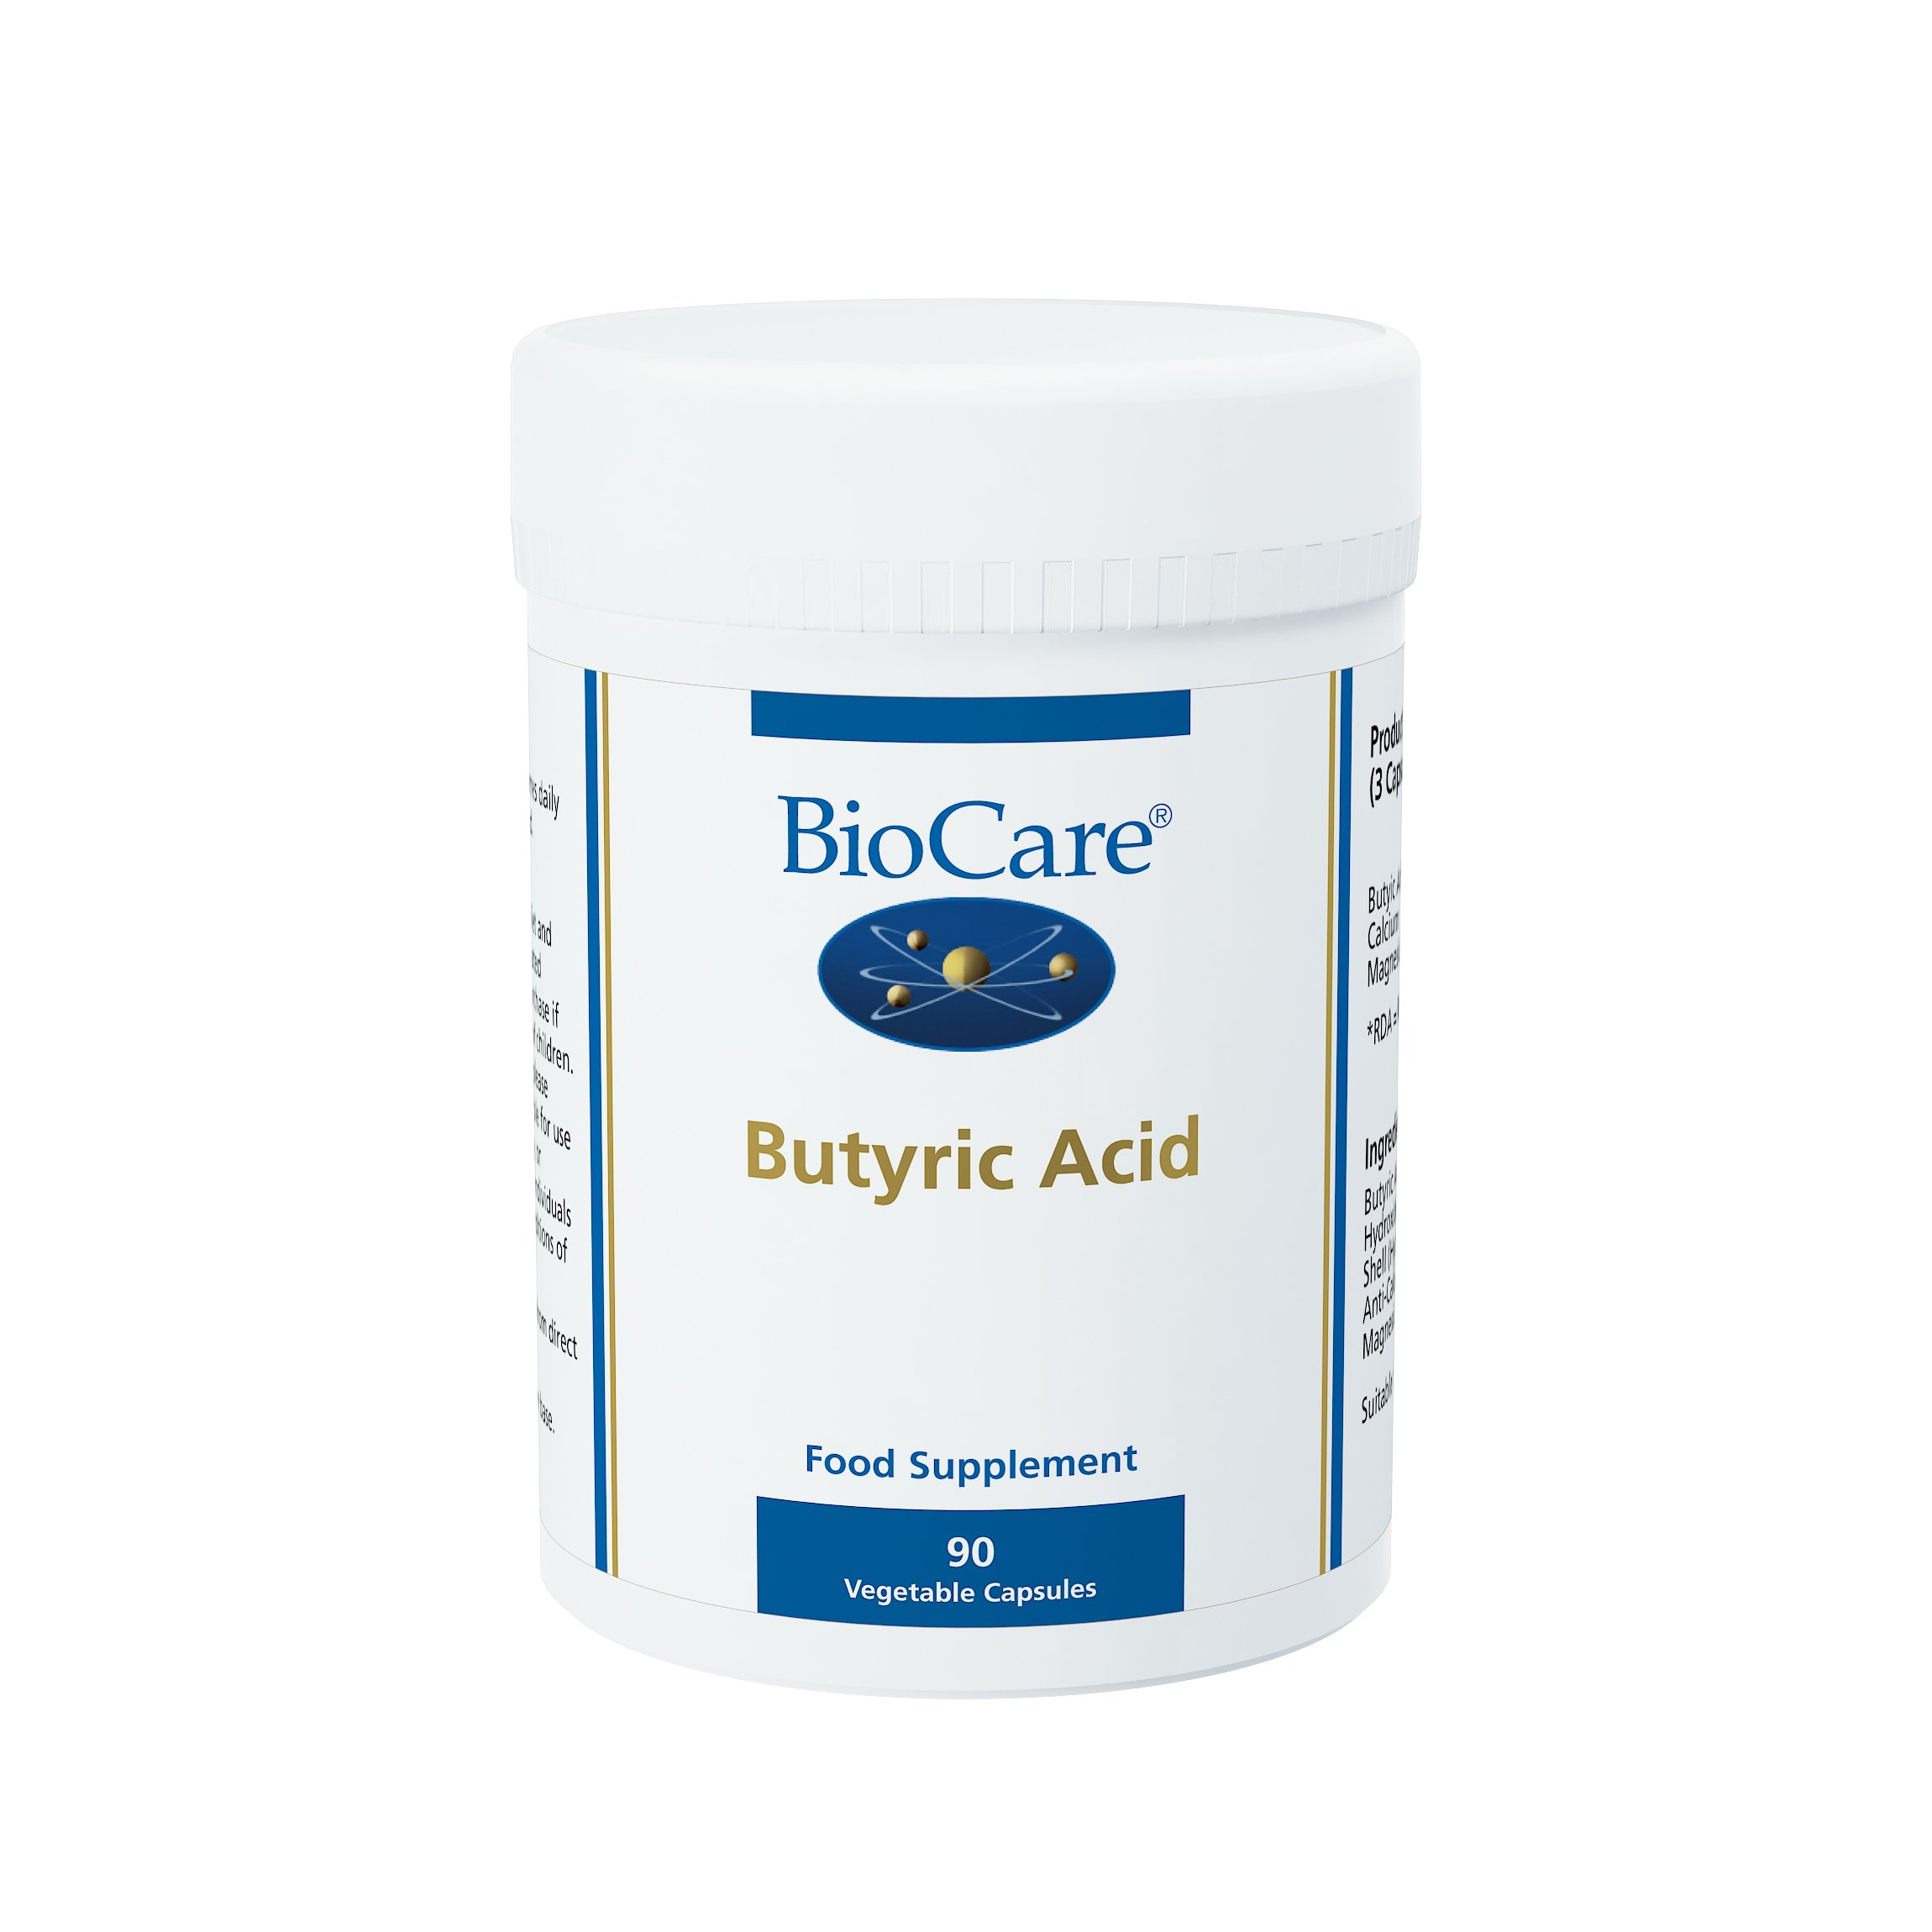 Biocare Butyric Acid Vegetable - Pack of 90 Capsules